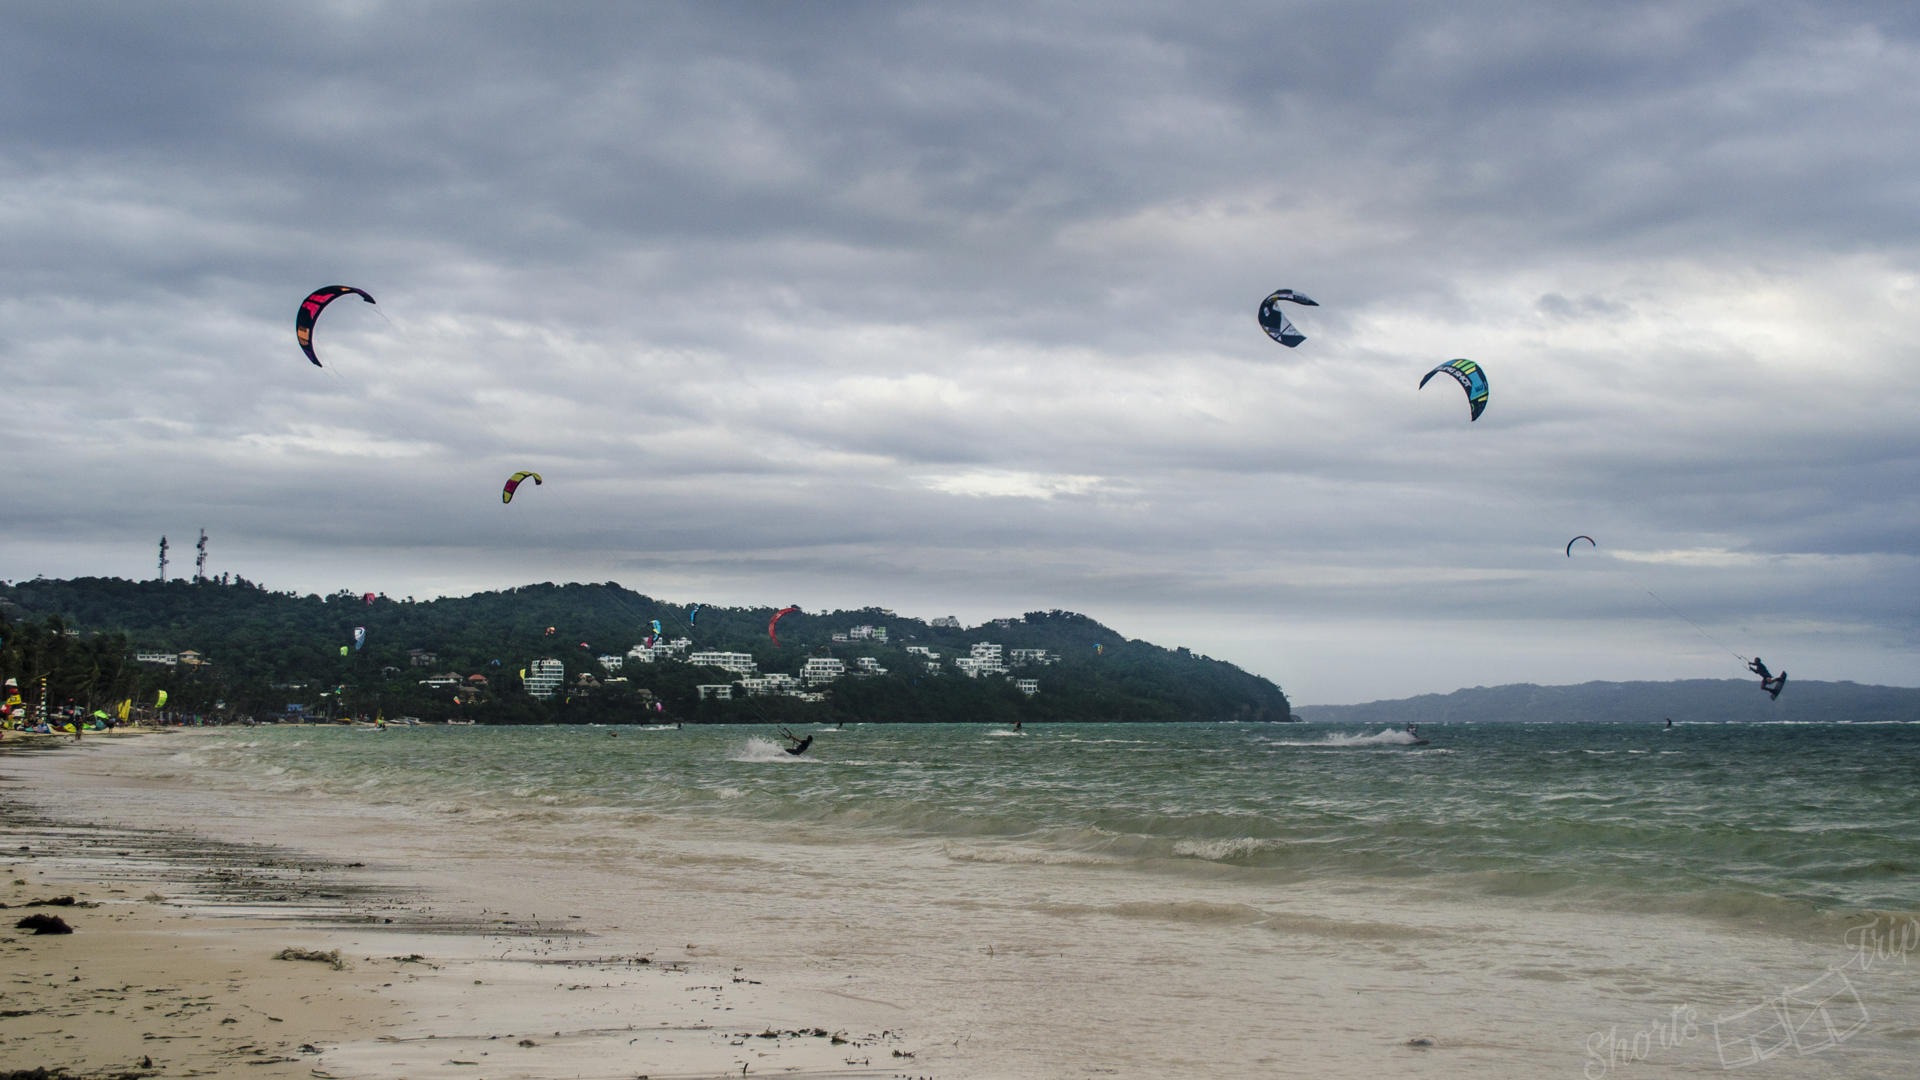 bulabog, bulabog beach, bulabog boracay, bulabog kite, bulabog, windsurf